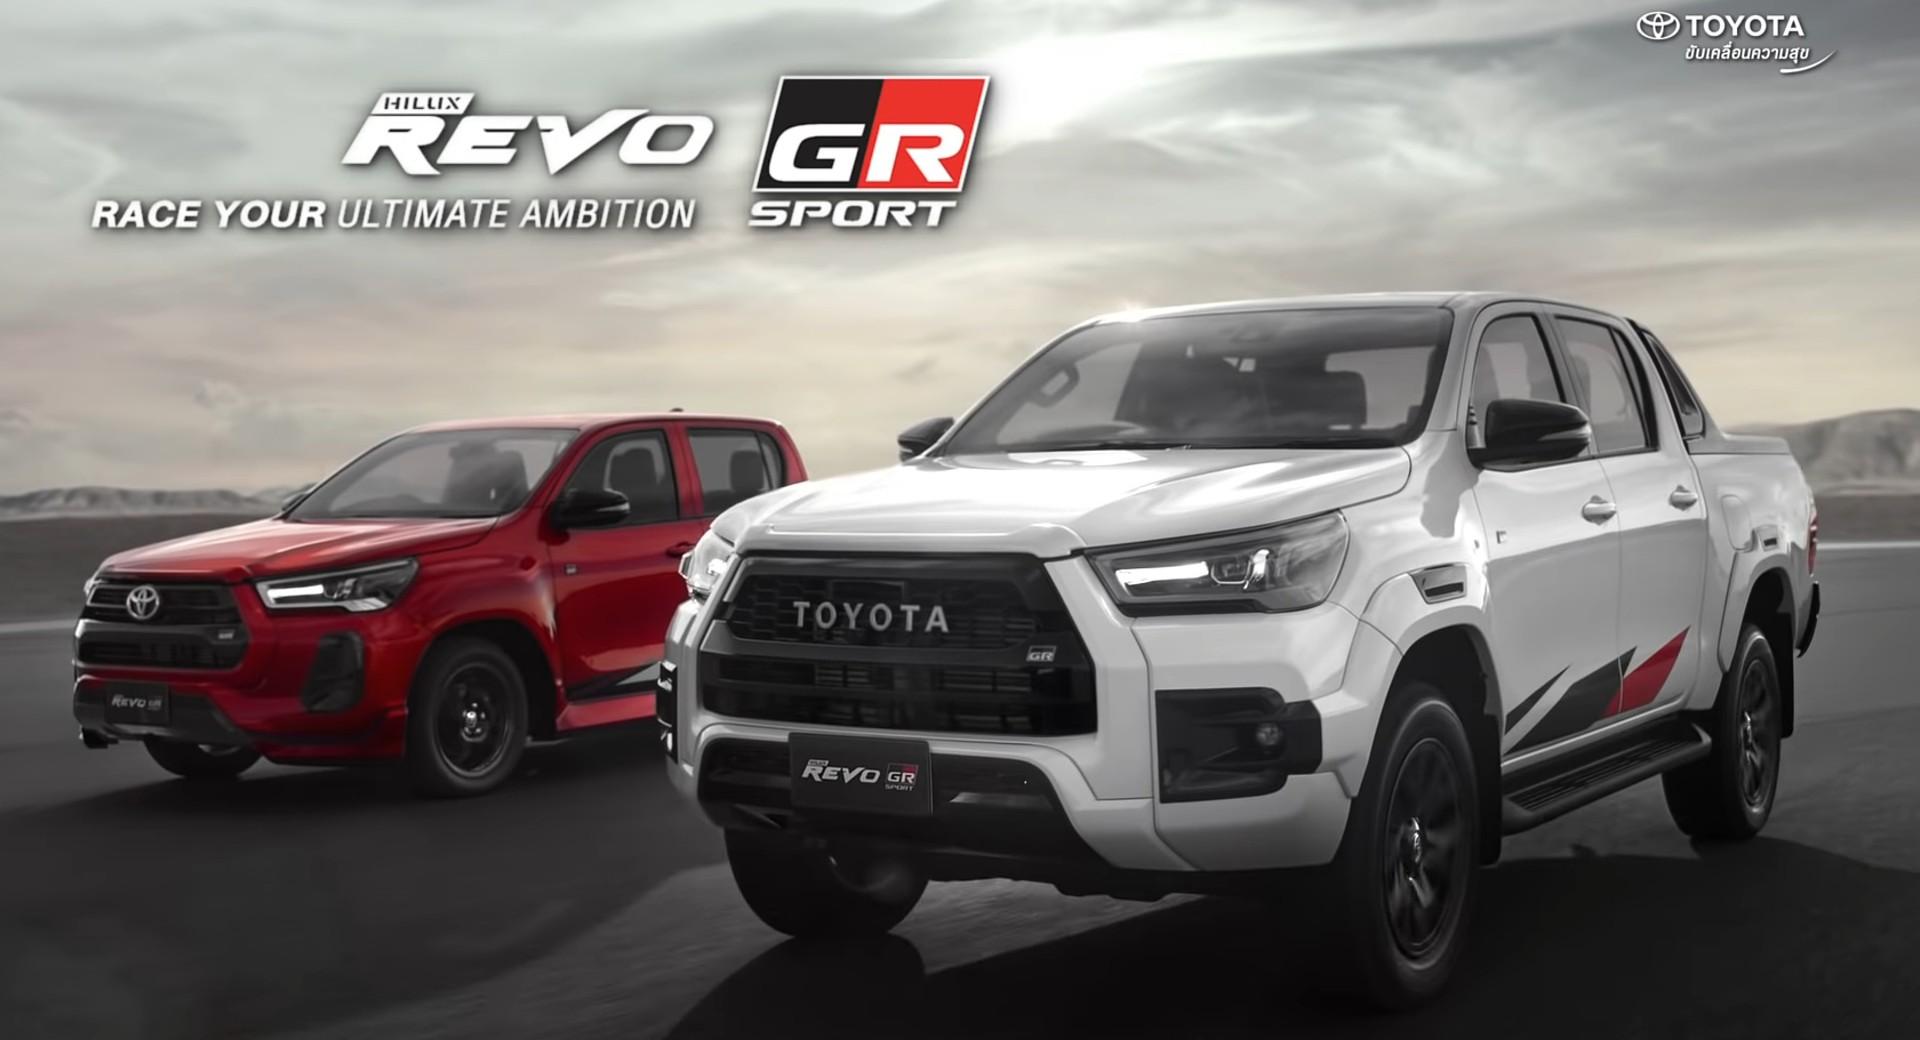 Toyota-Hilux-Revo-GR-Sport-2